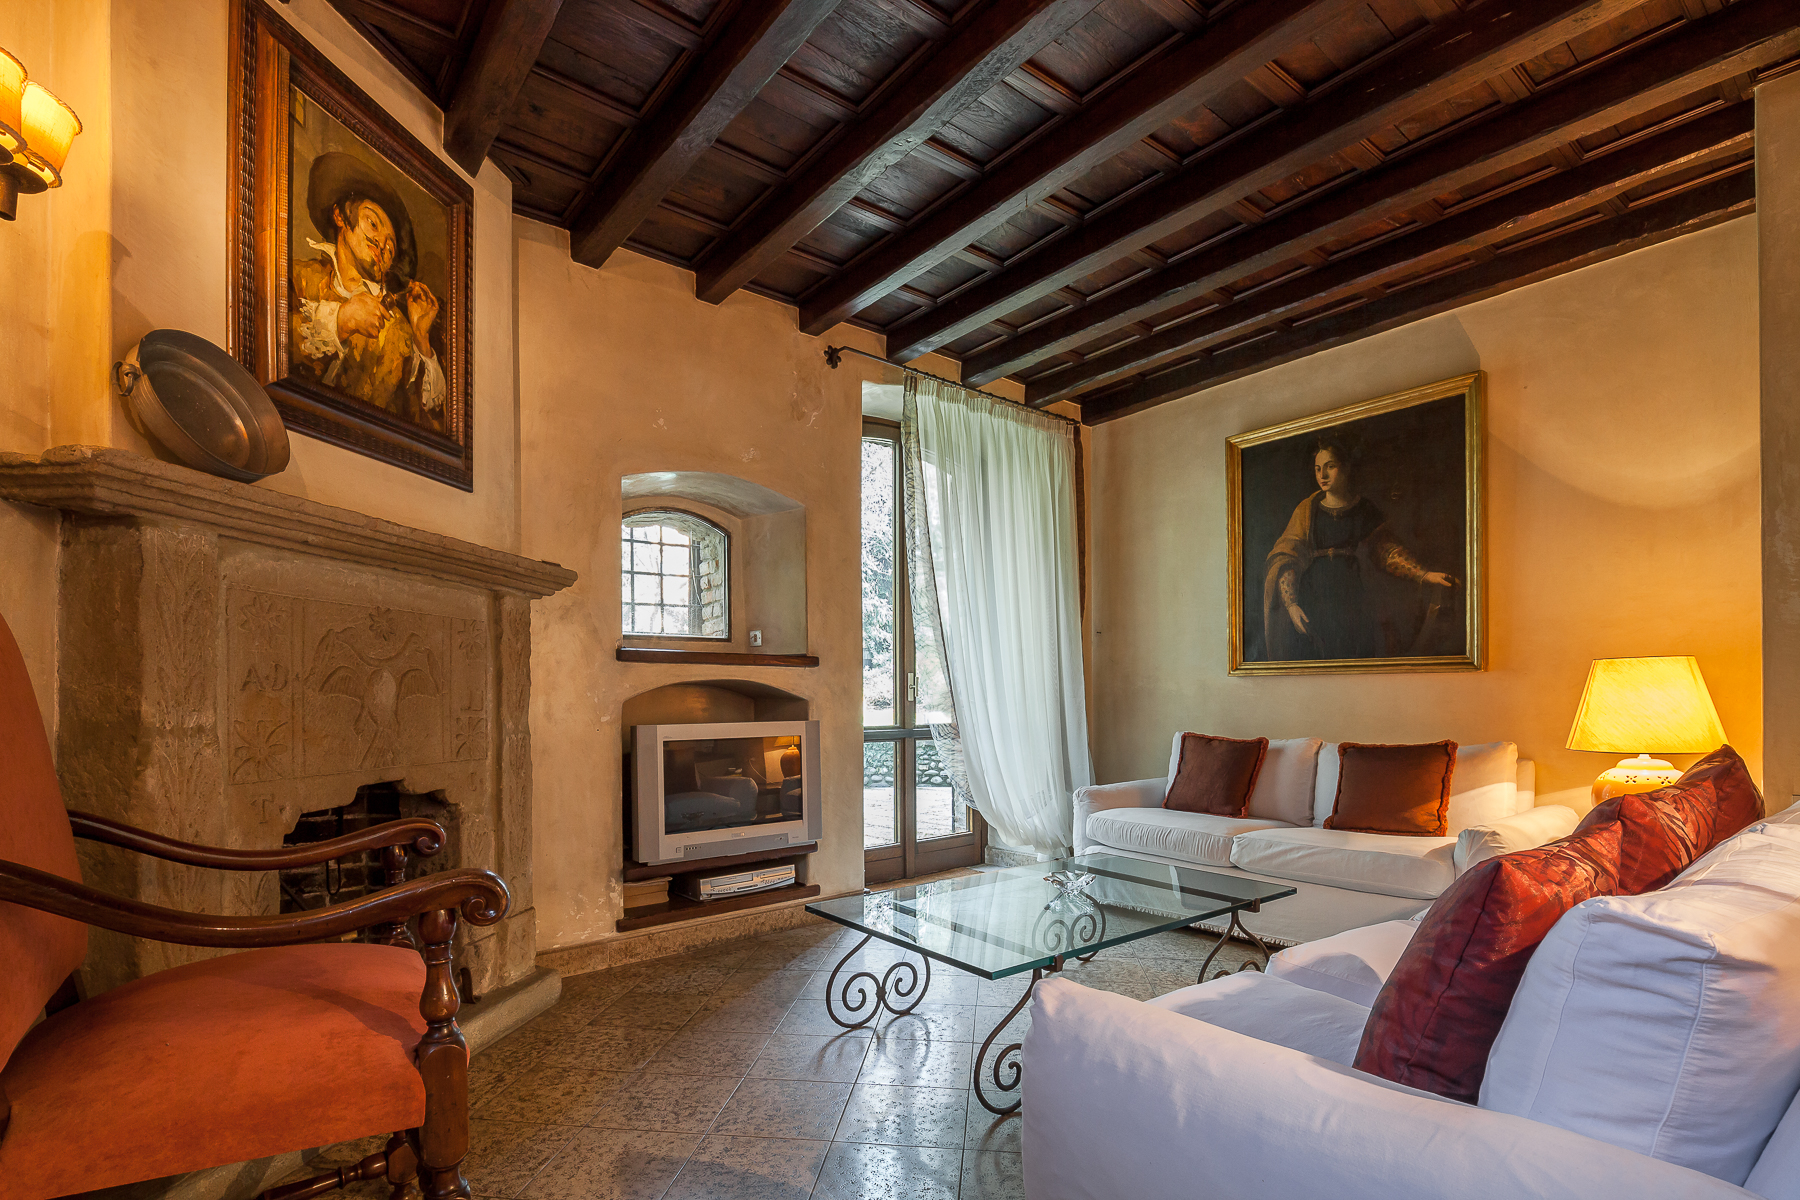 Villa in Vendita a Gorle: 5 locali, 850 mq - Foto 6